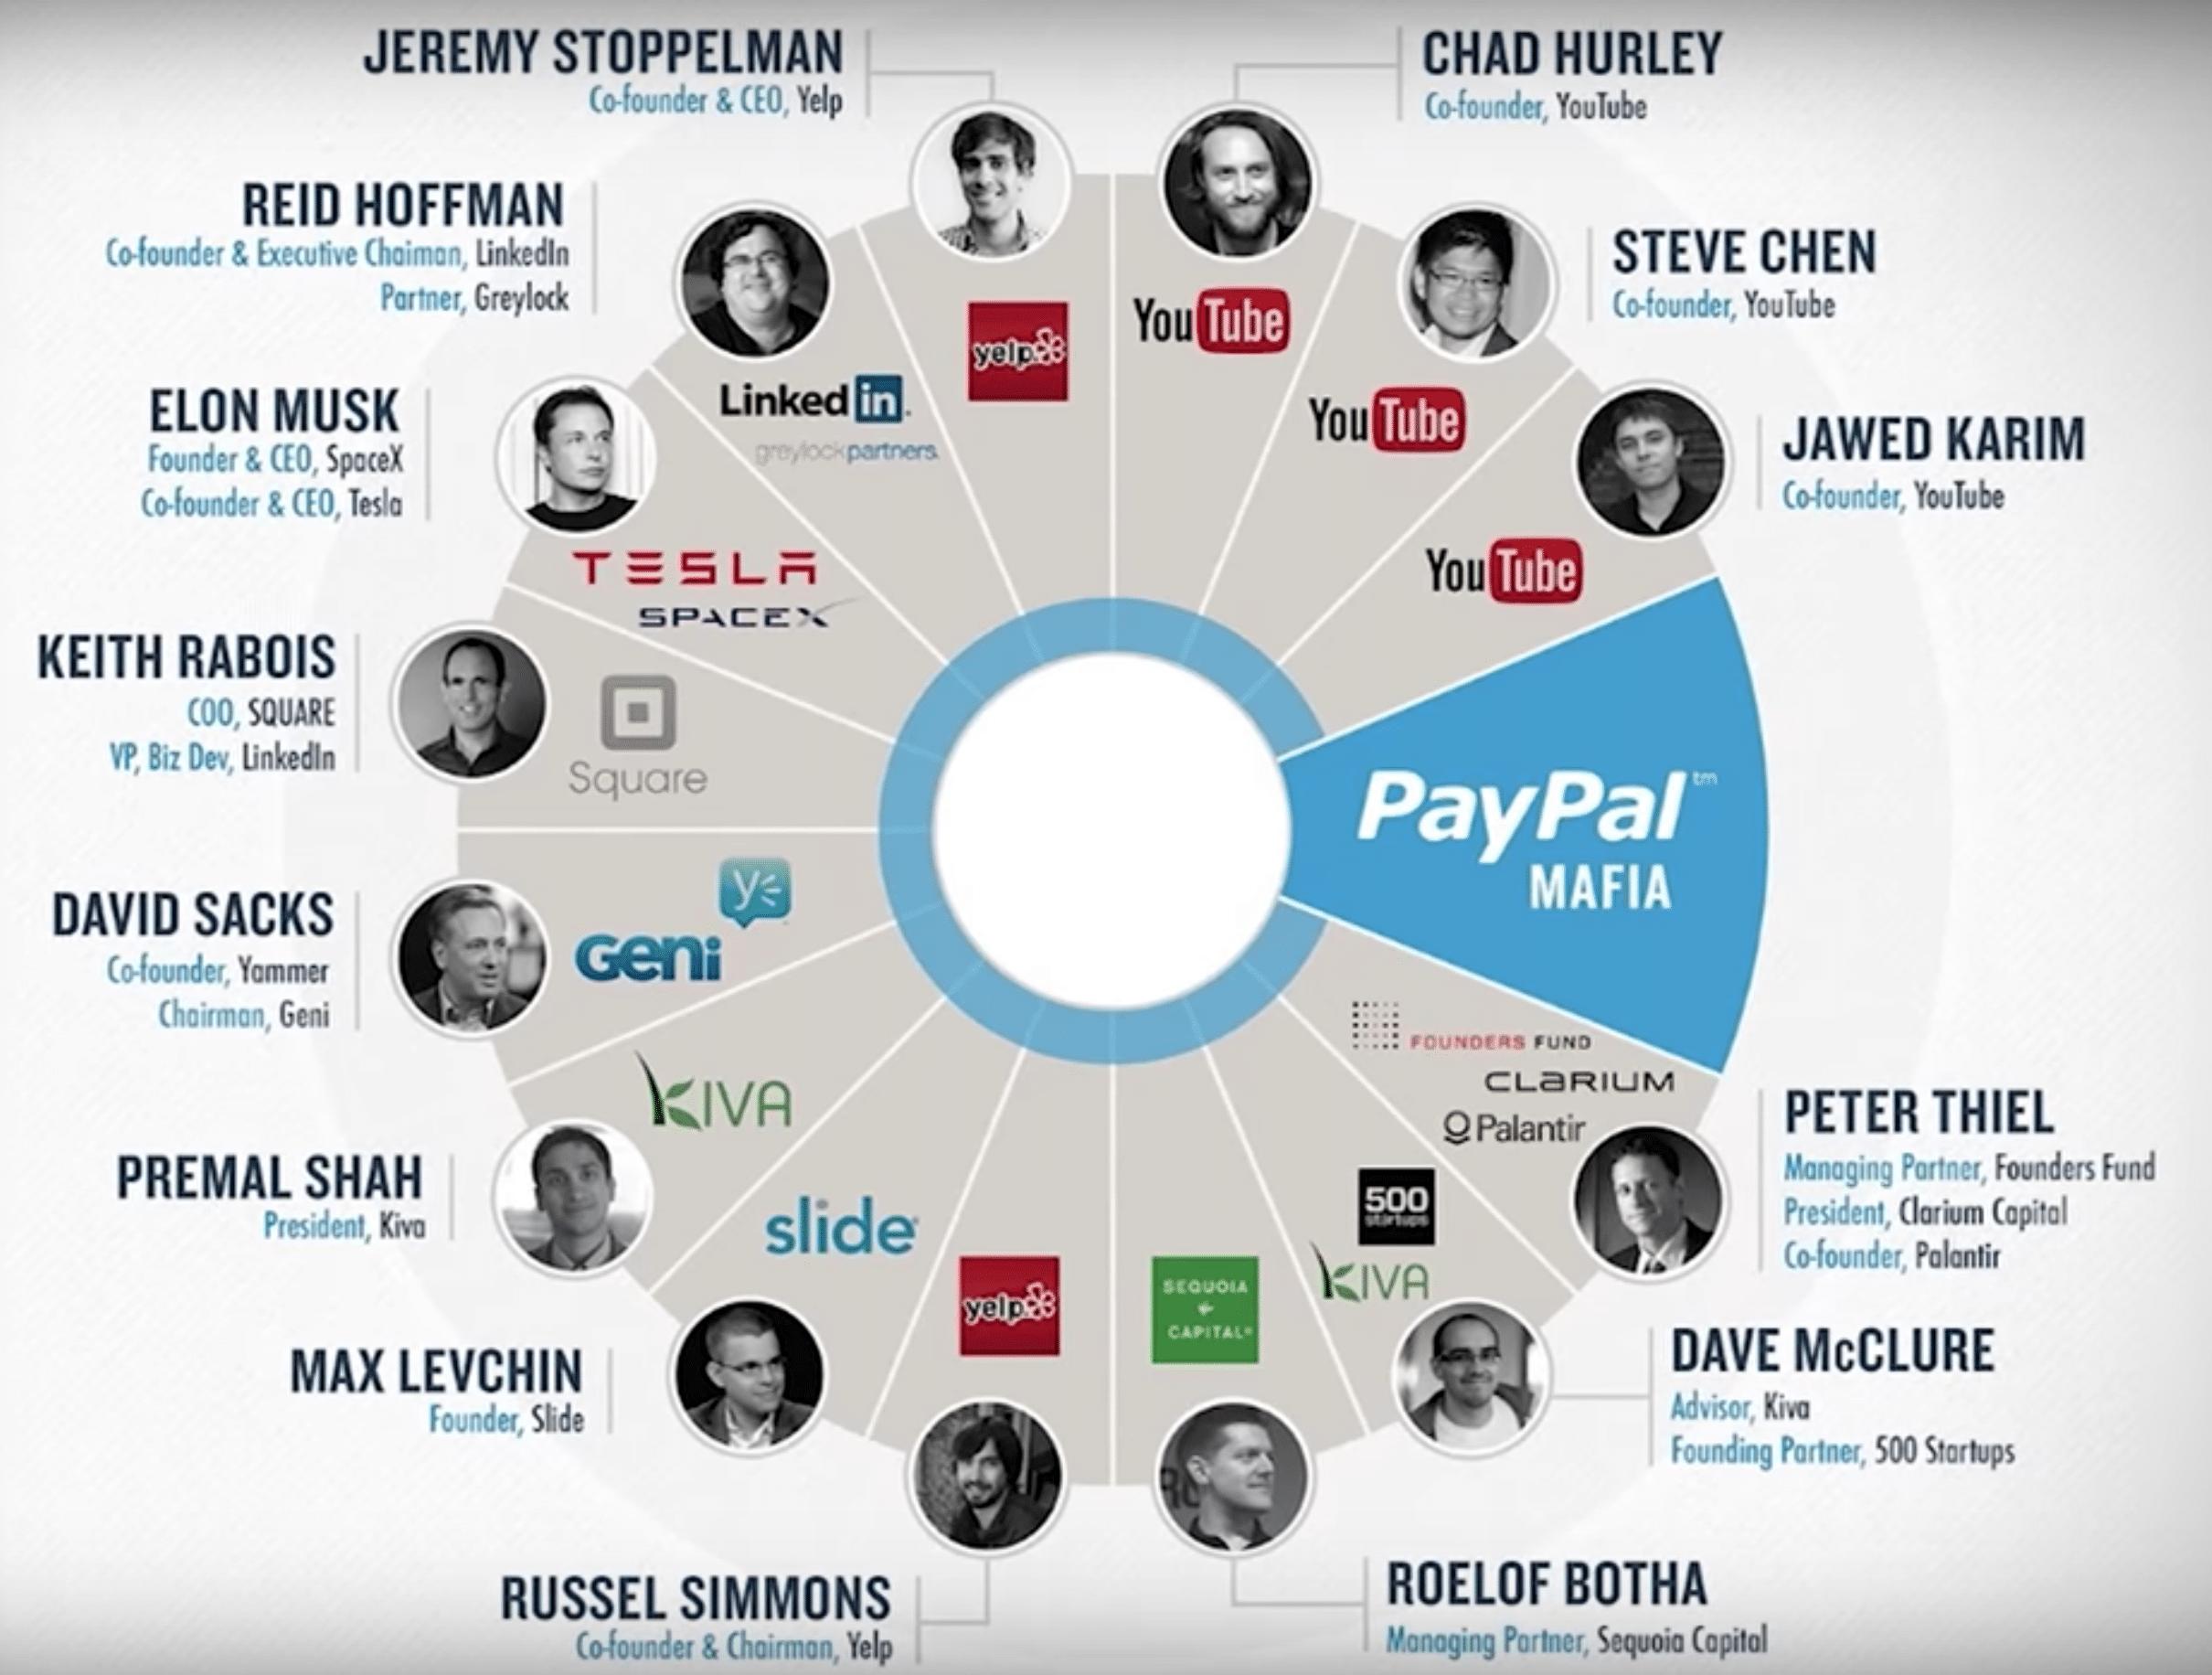 A Máfia do PayPal